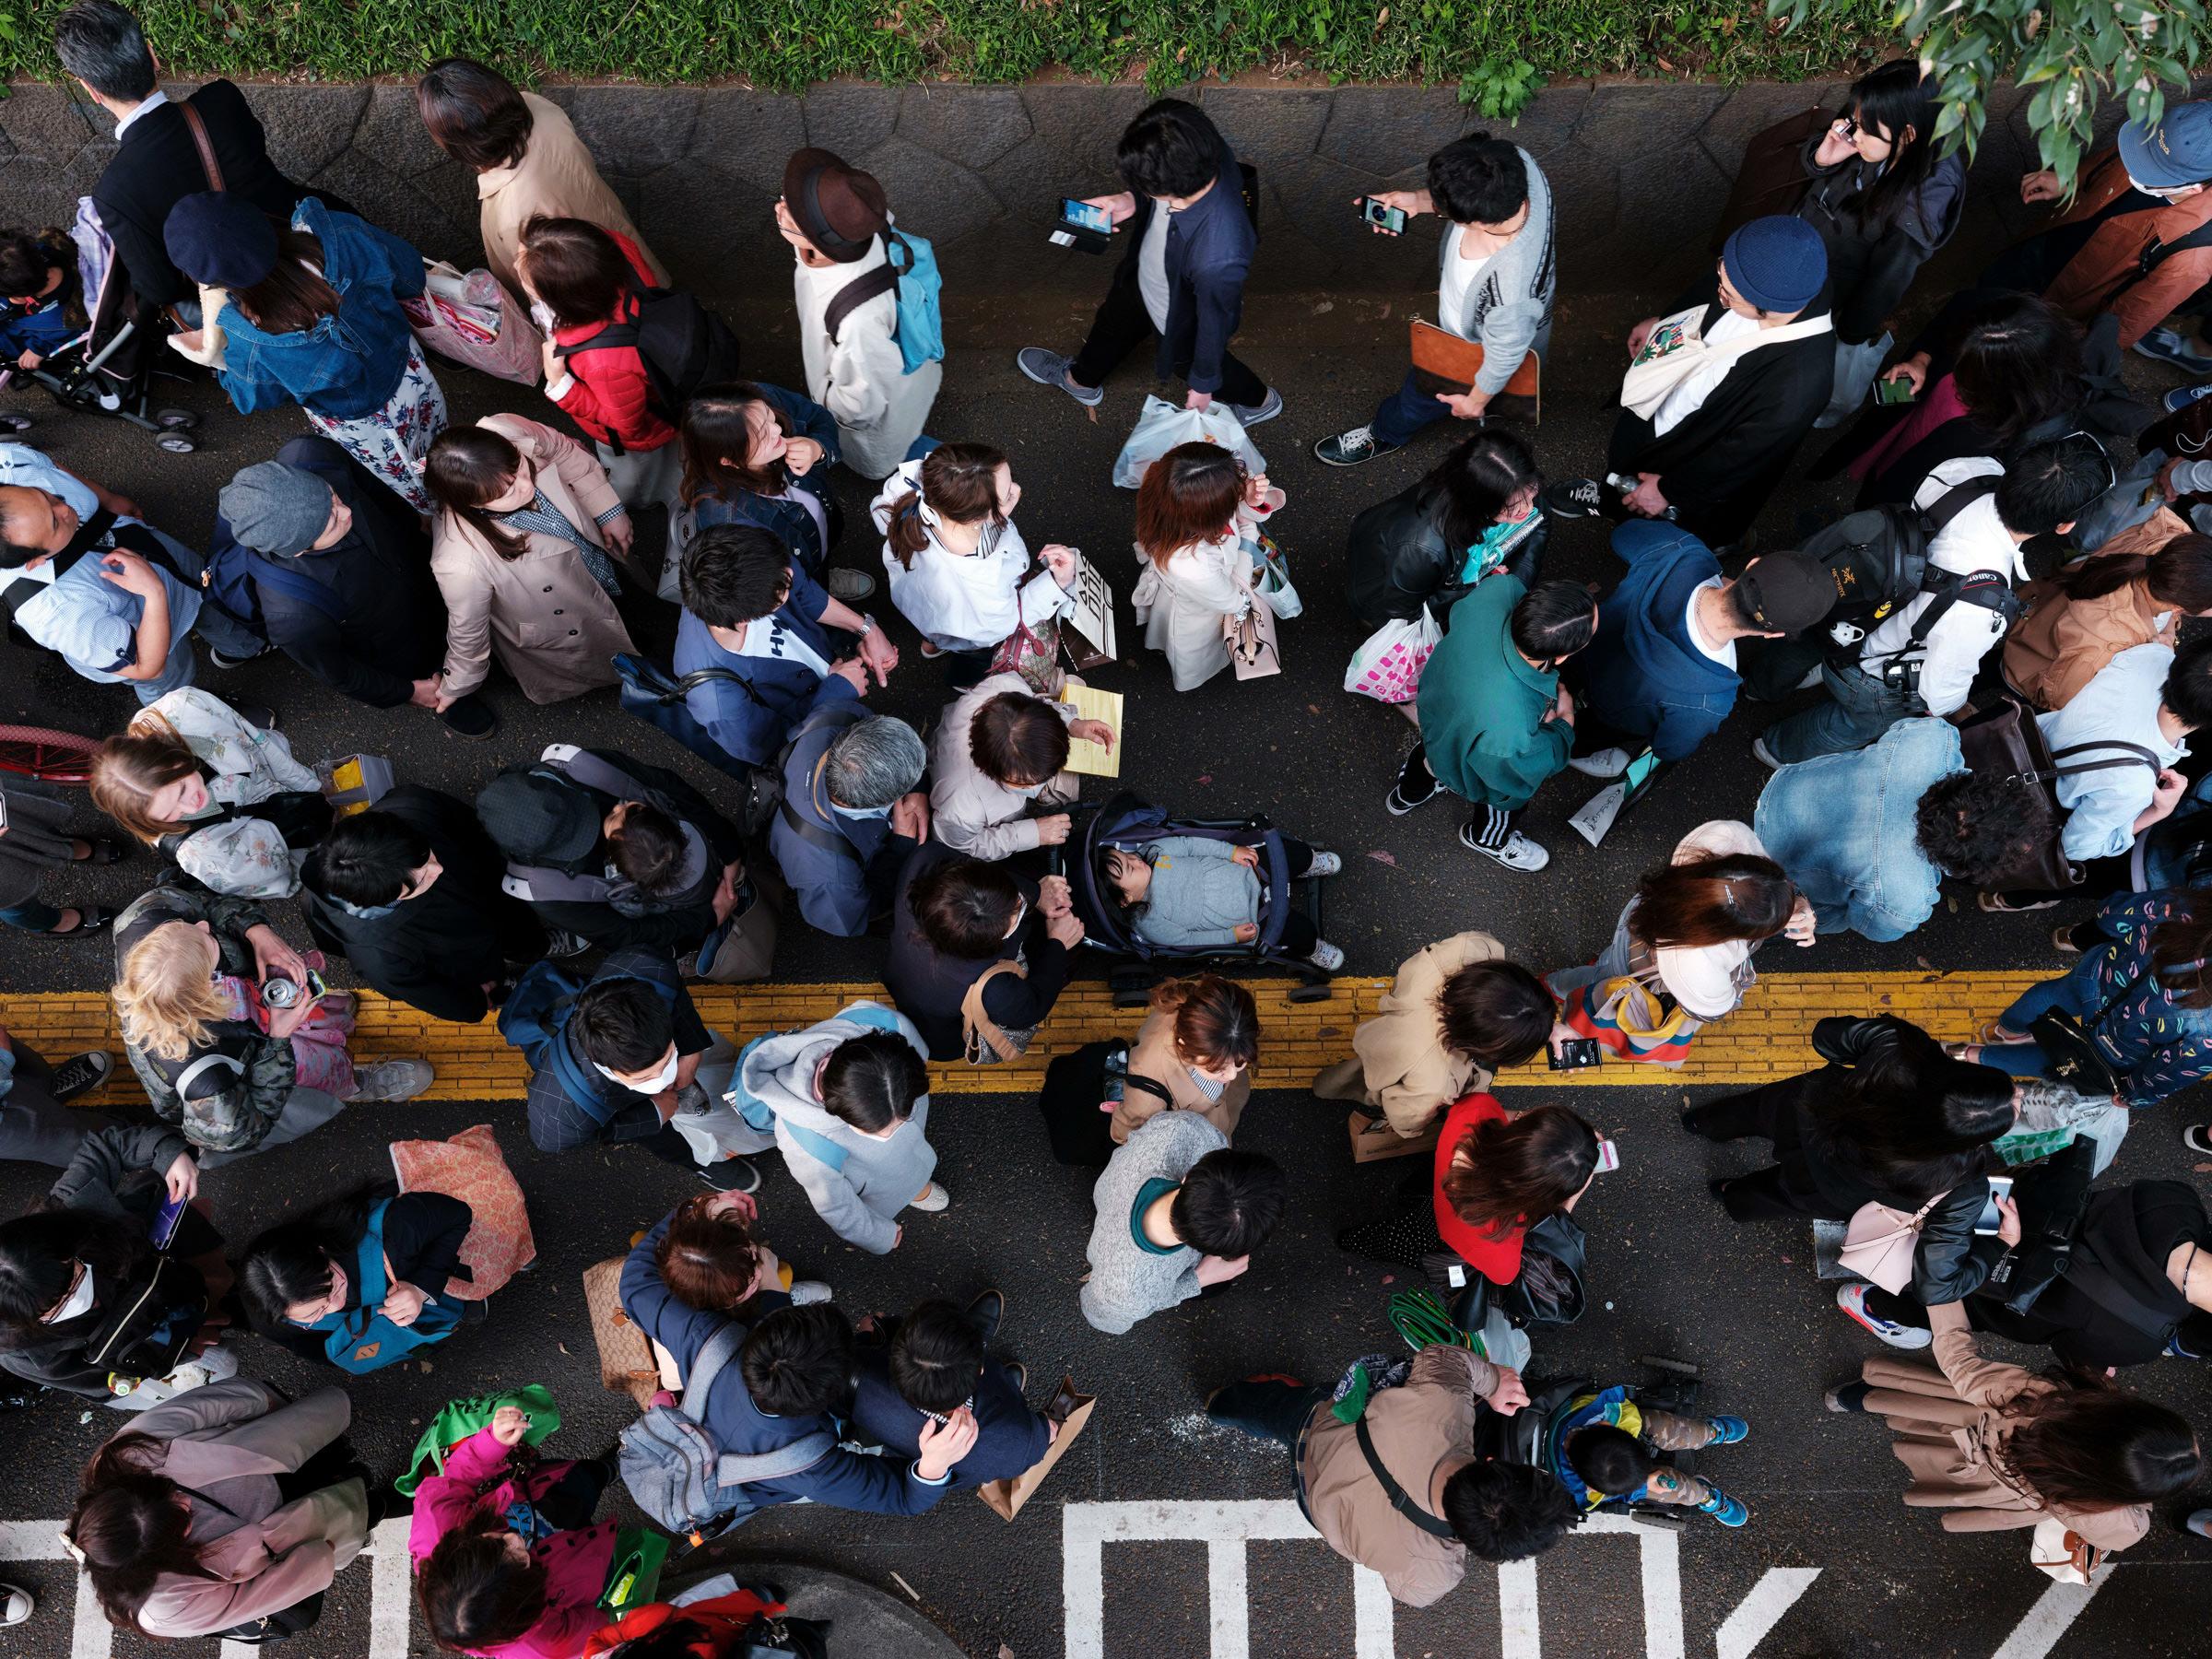 Fujifilm-GFX-Japan-Street-Photography-23